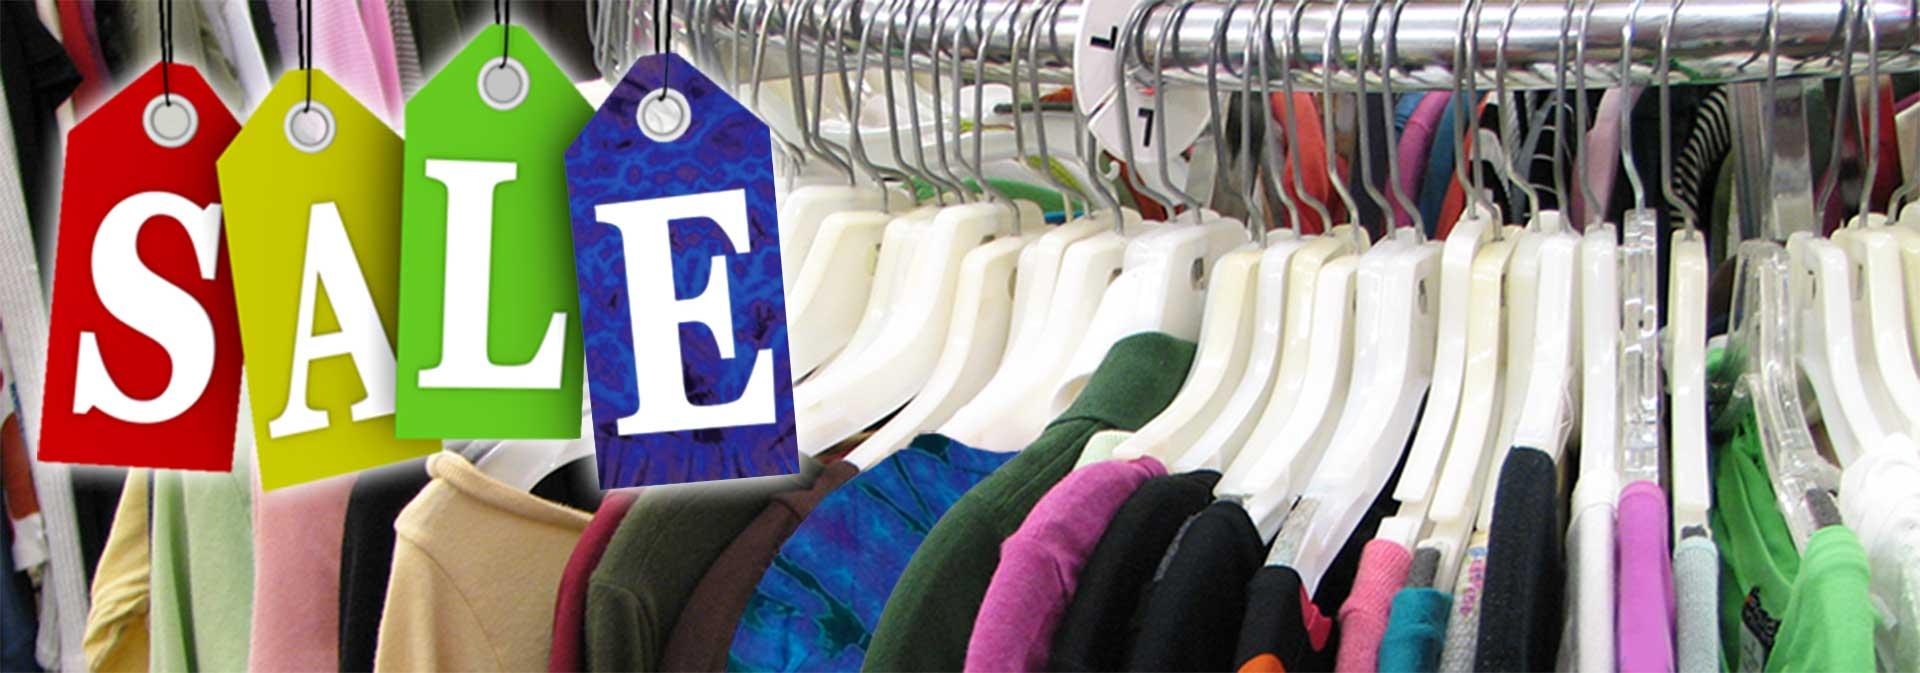 Infinitee T-shirts & Tank Tops Sales Rack